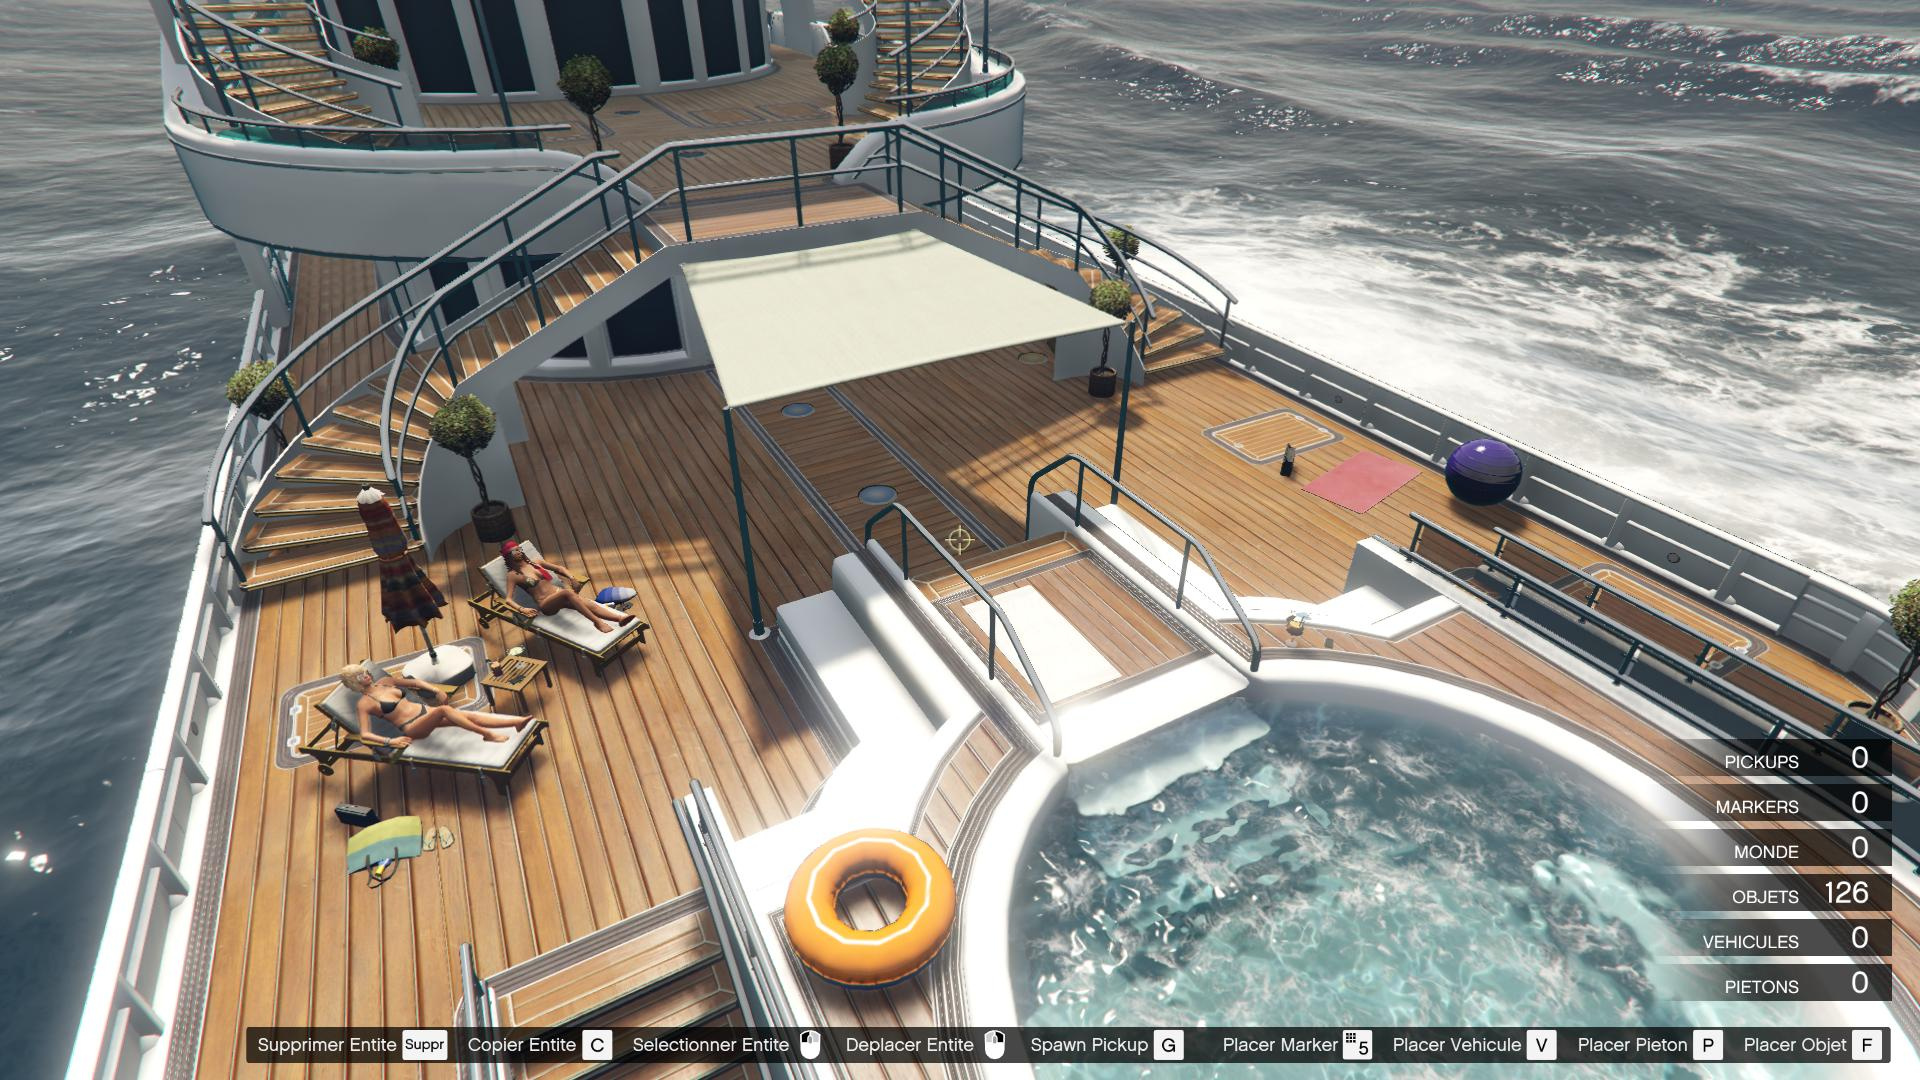 Bureau de luxe gta bureau de luxe gta yacht deluxe ymap gta